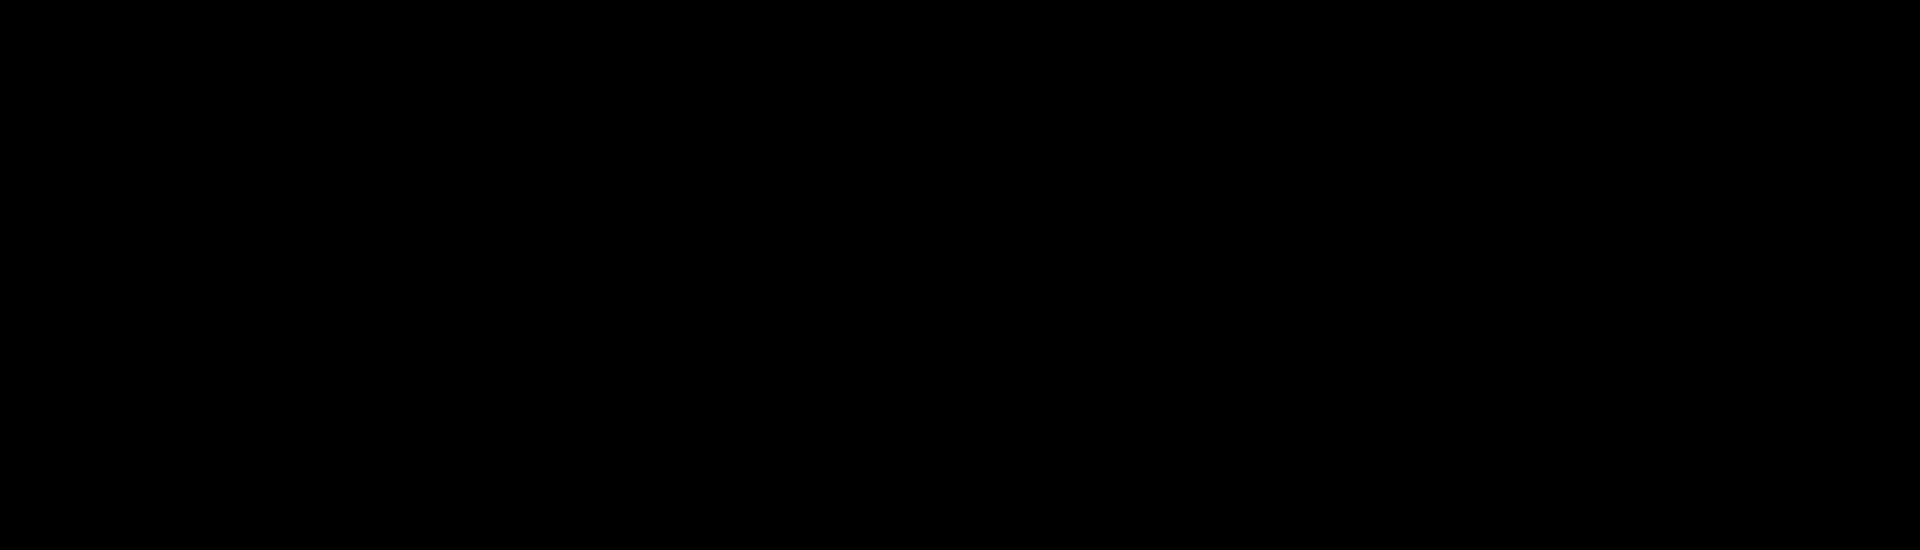 Augustus Gloop Cakes Wales BBC Logo CBBC